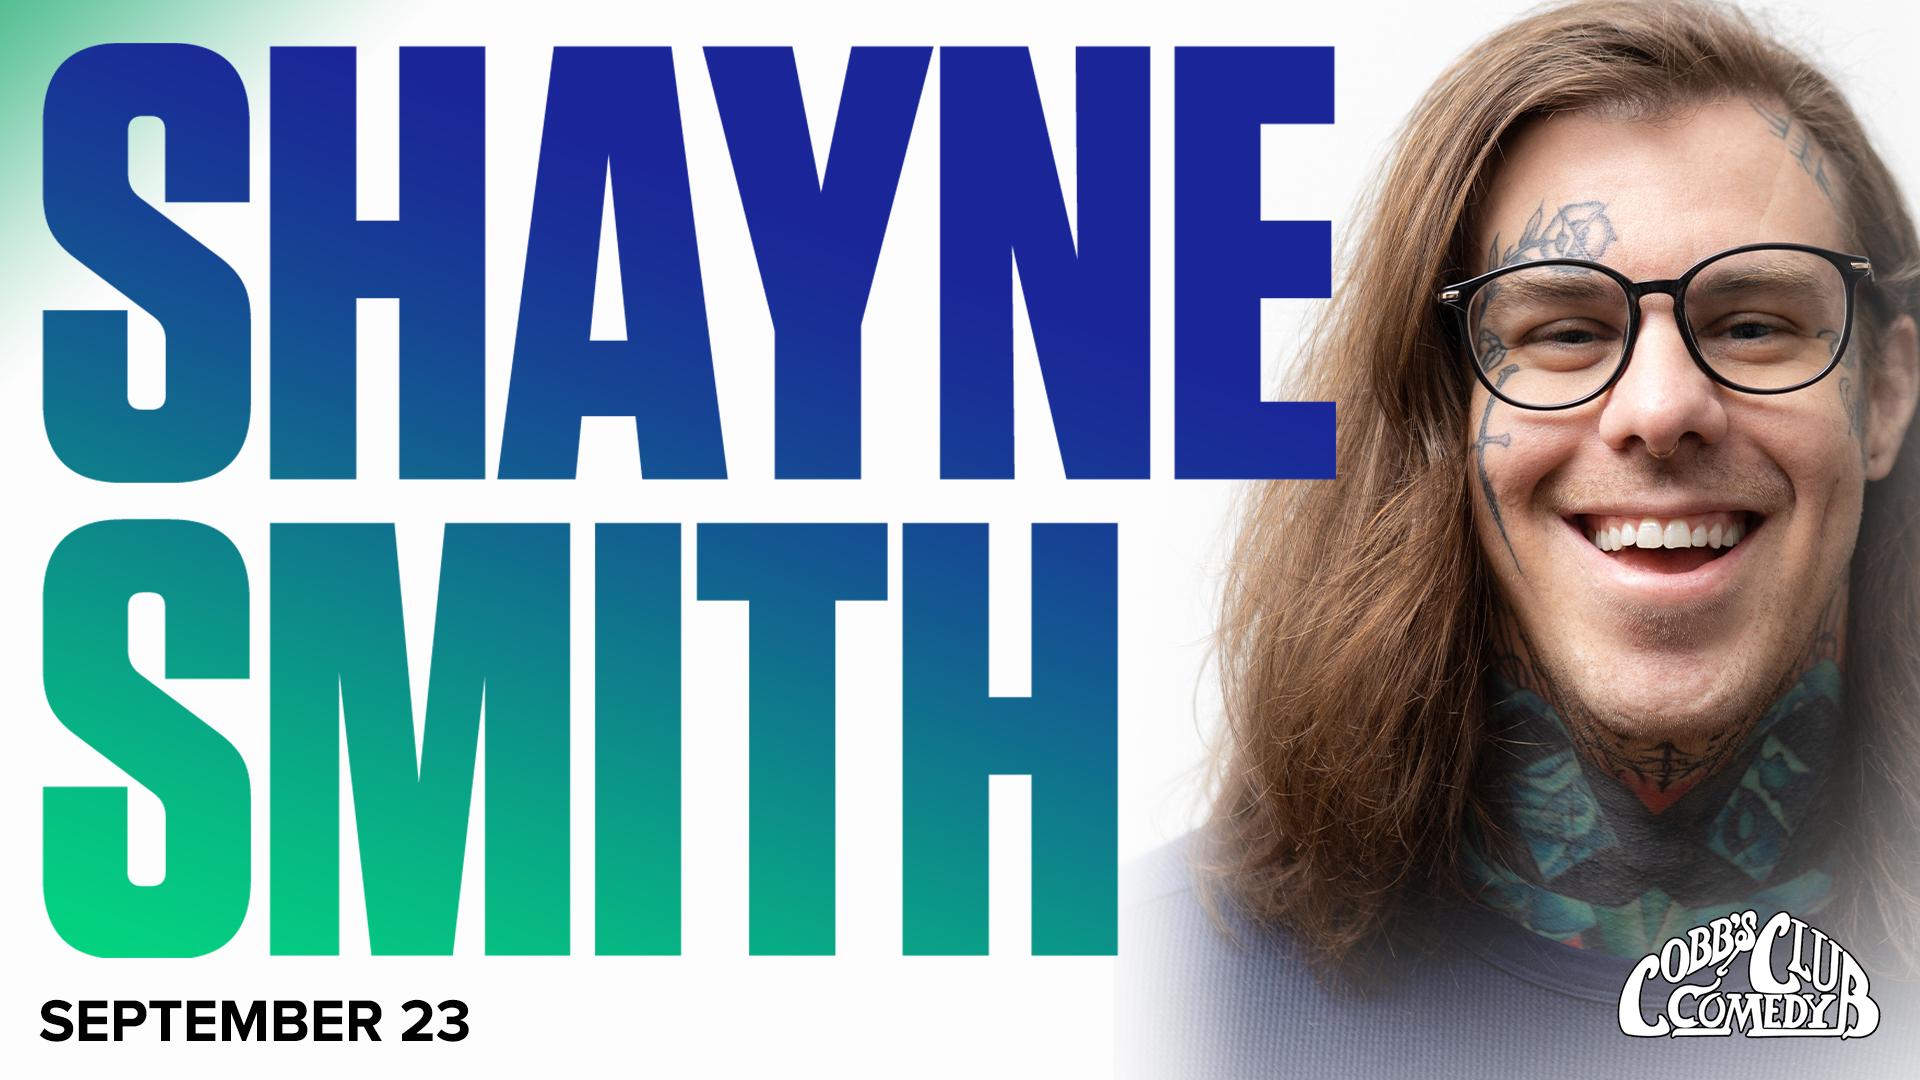 Shayne Smith